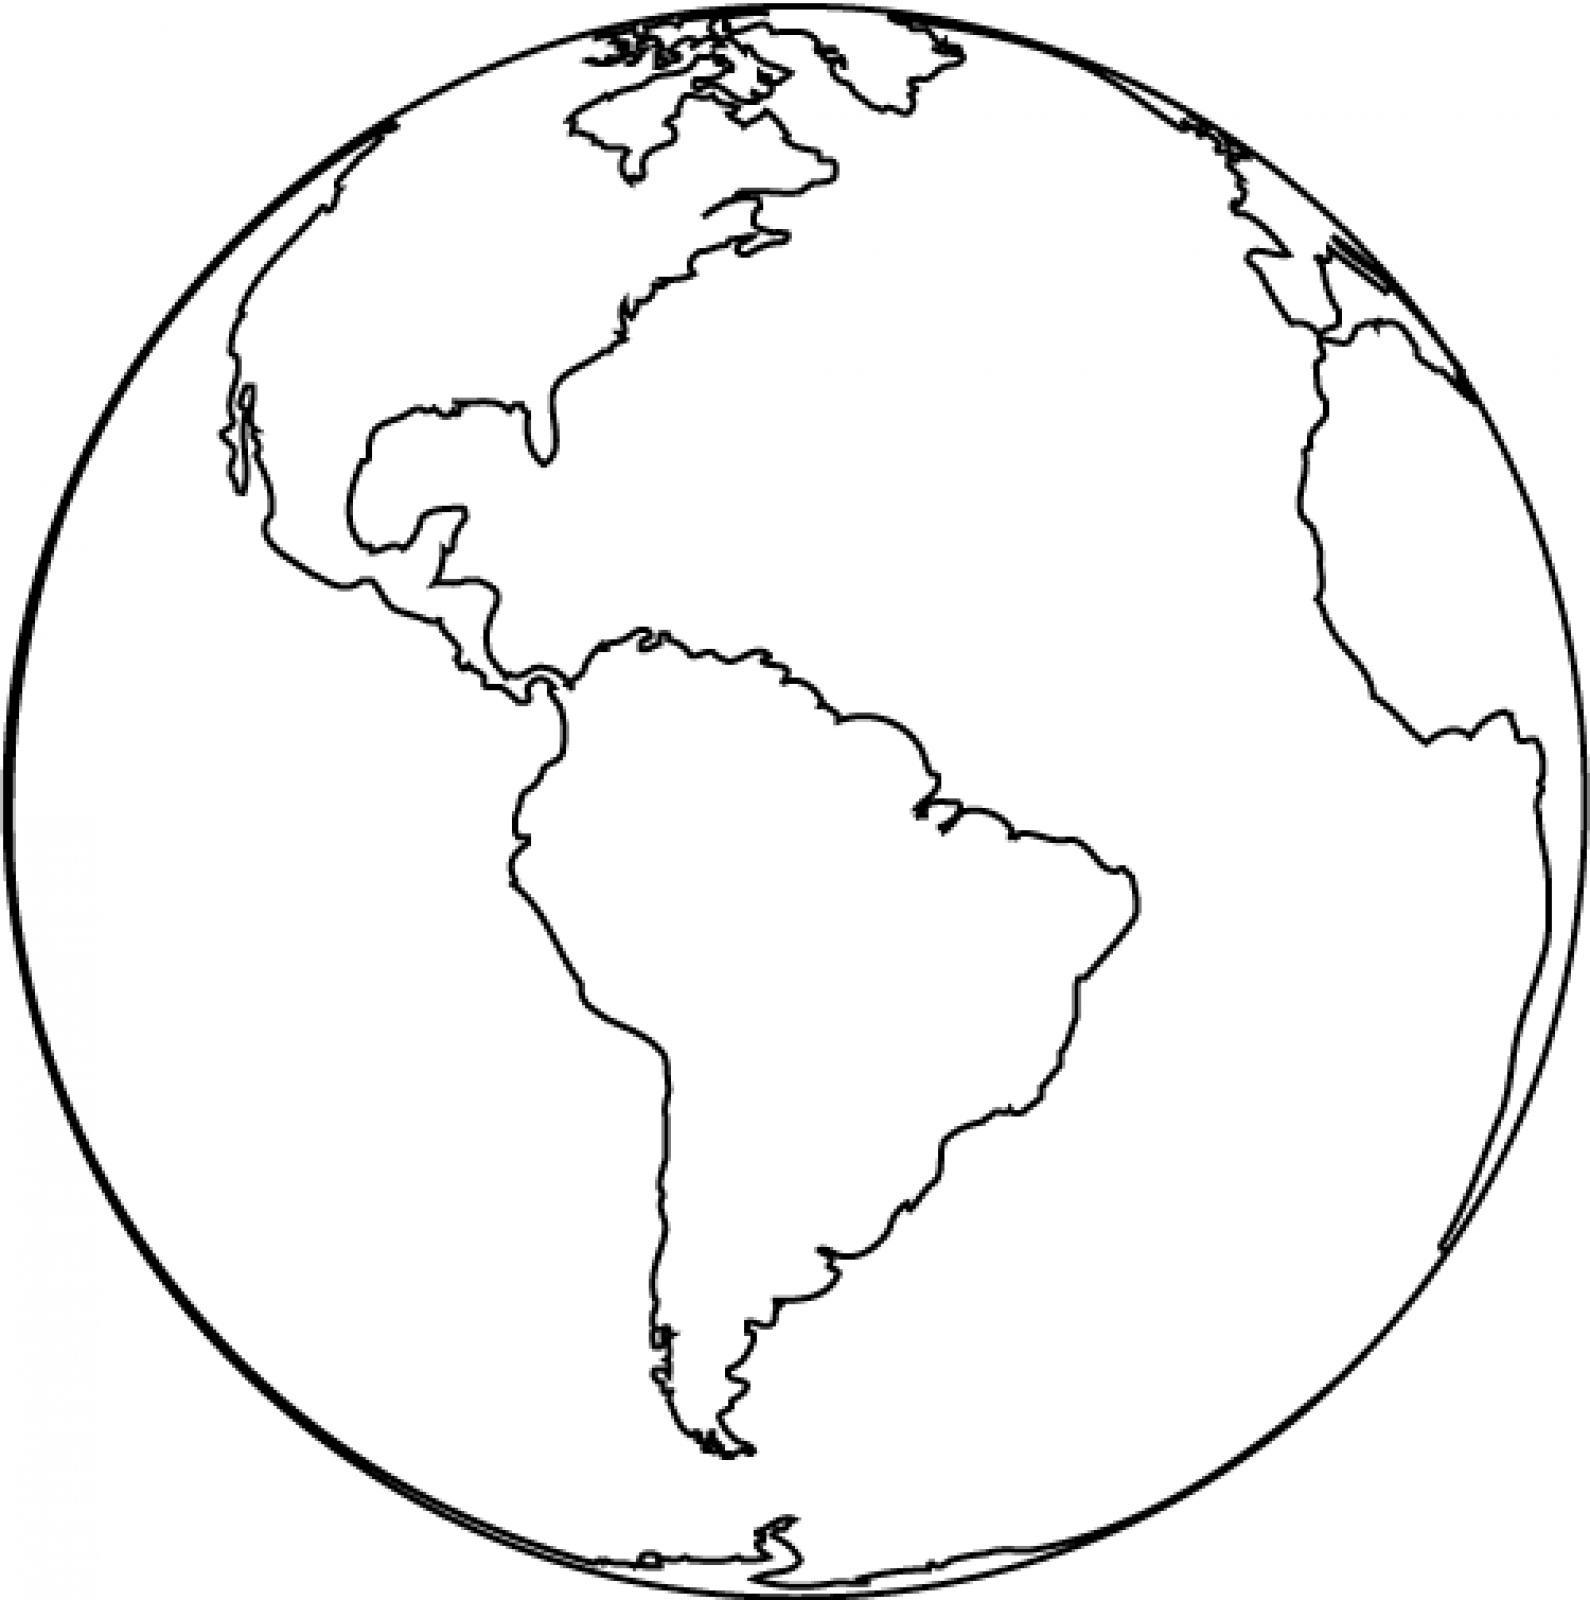 Earth Drawing At Getdrawings